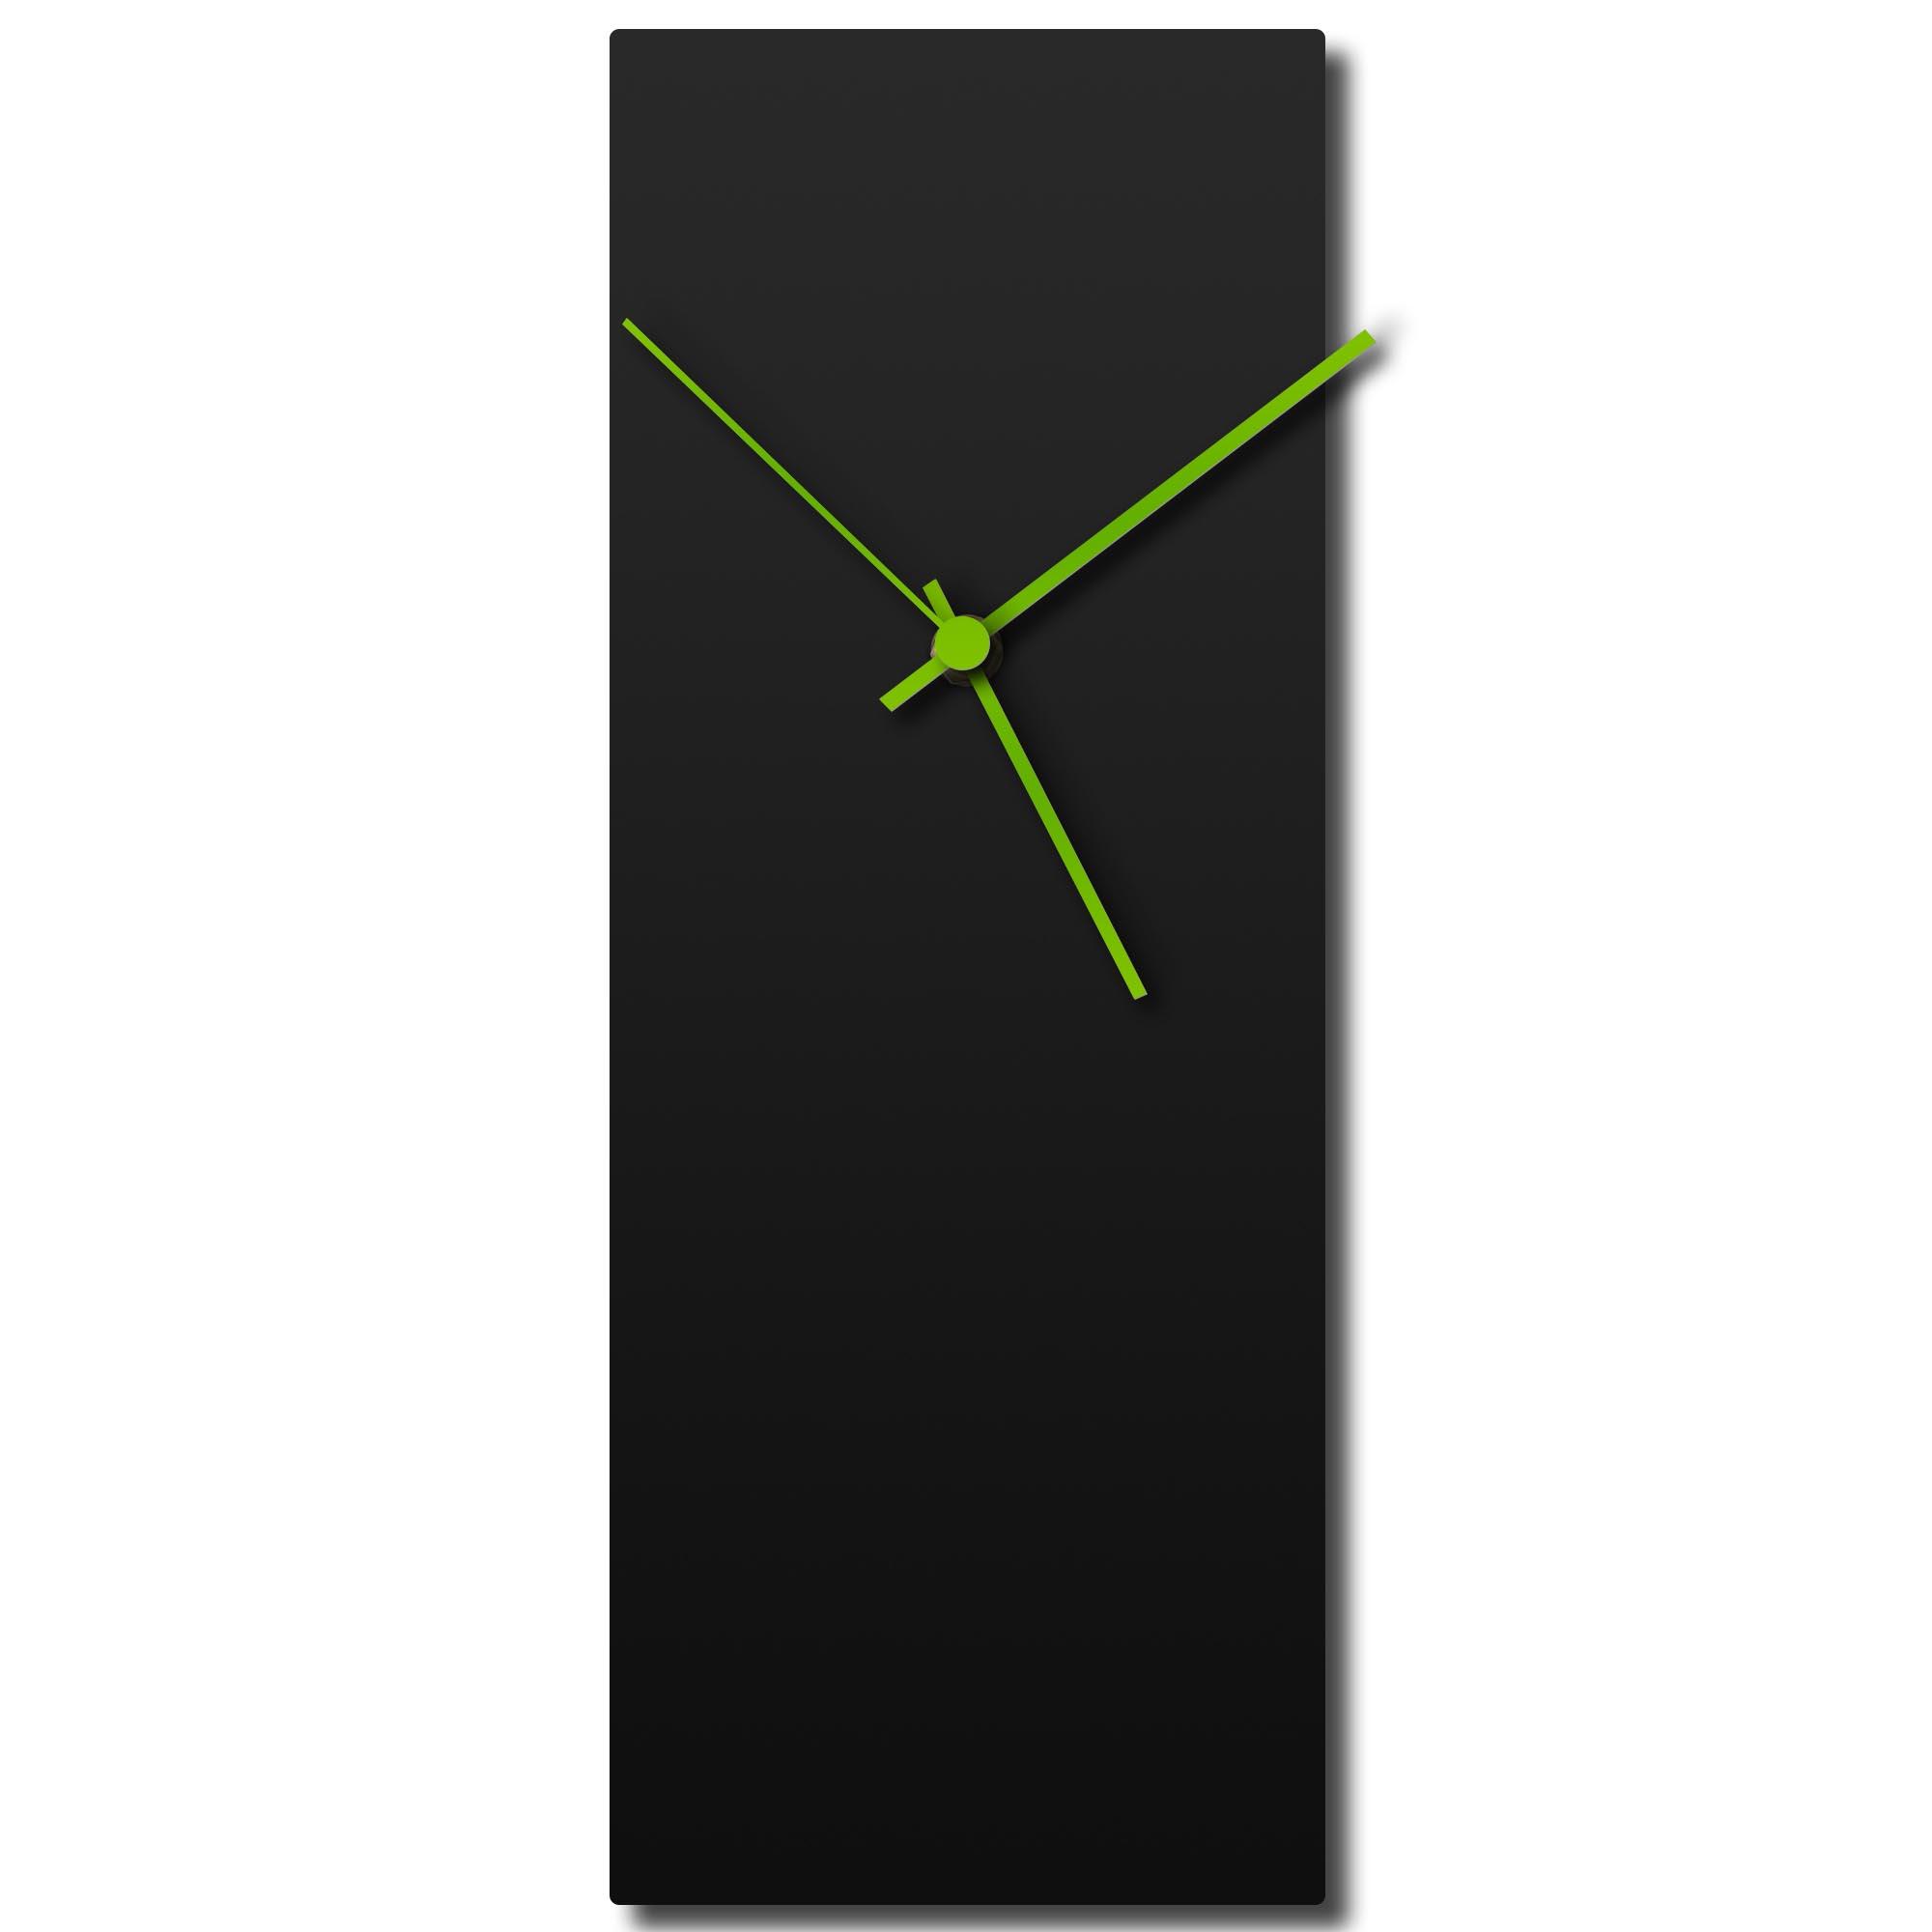 Blackout Green Clock 6x16in. Aluminum Polymetal